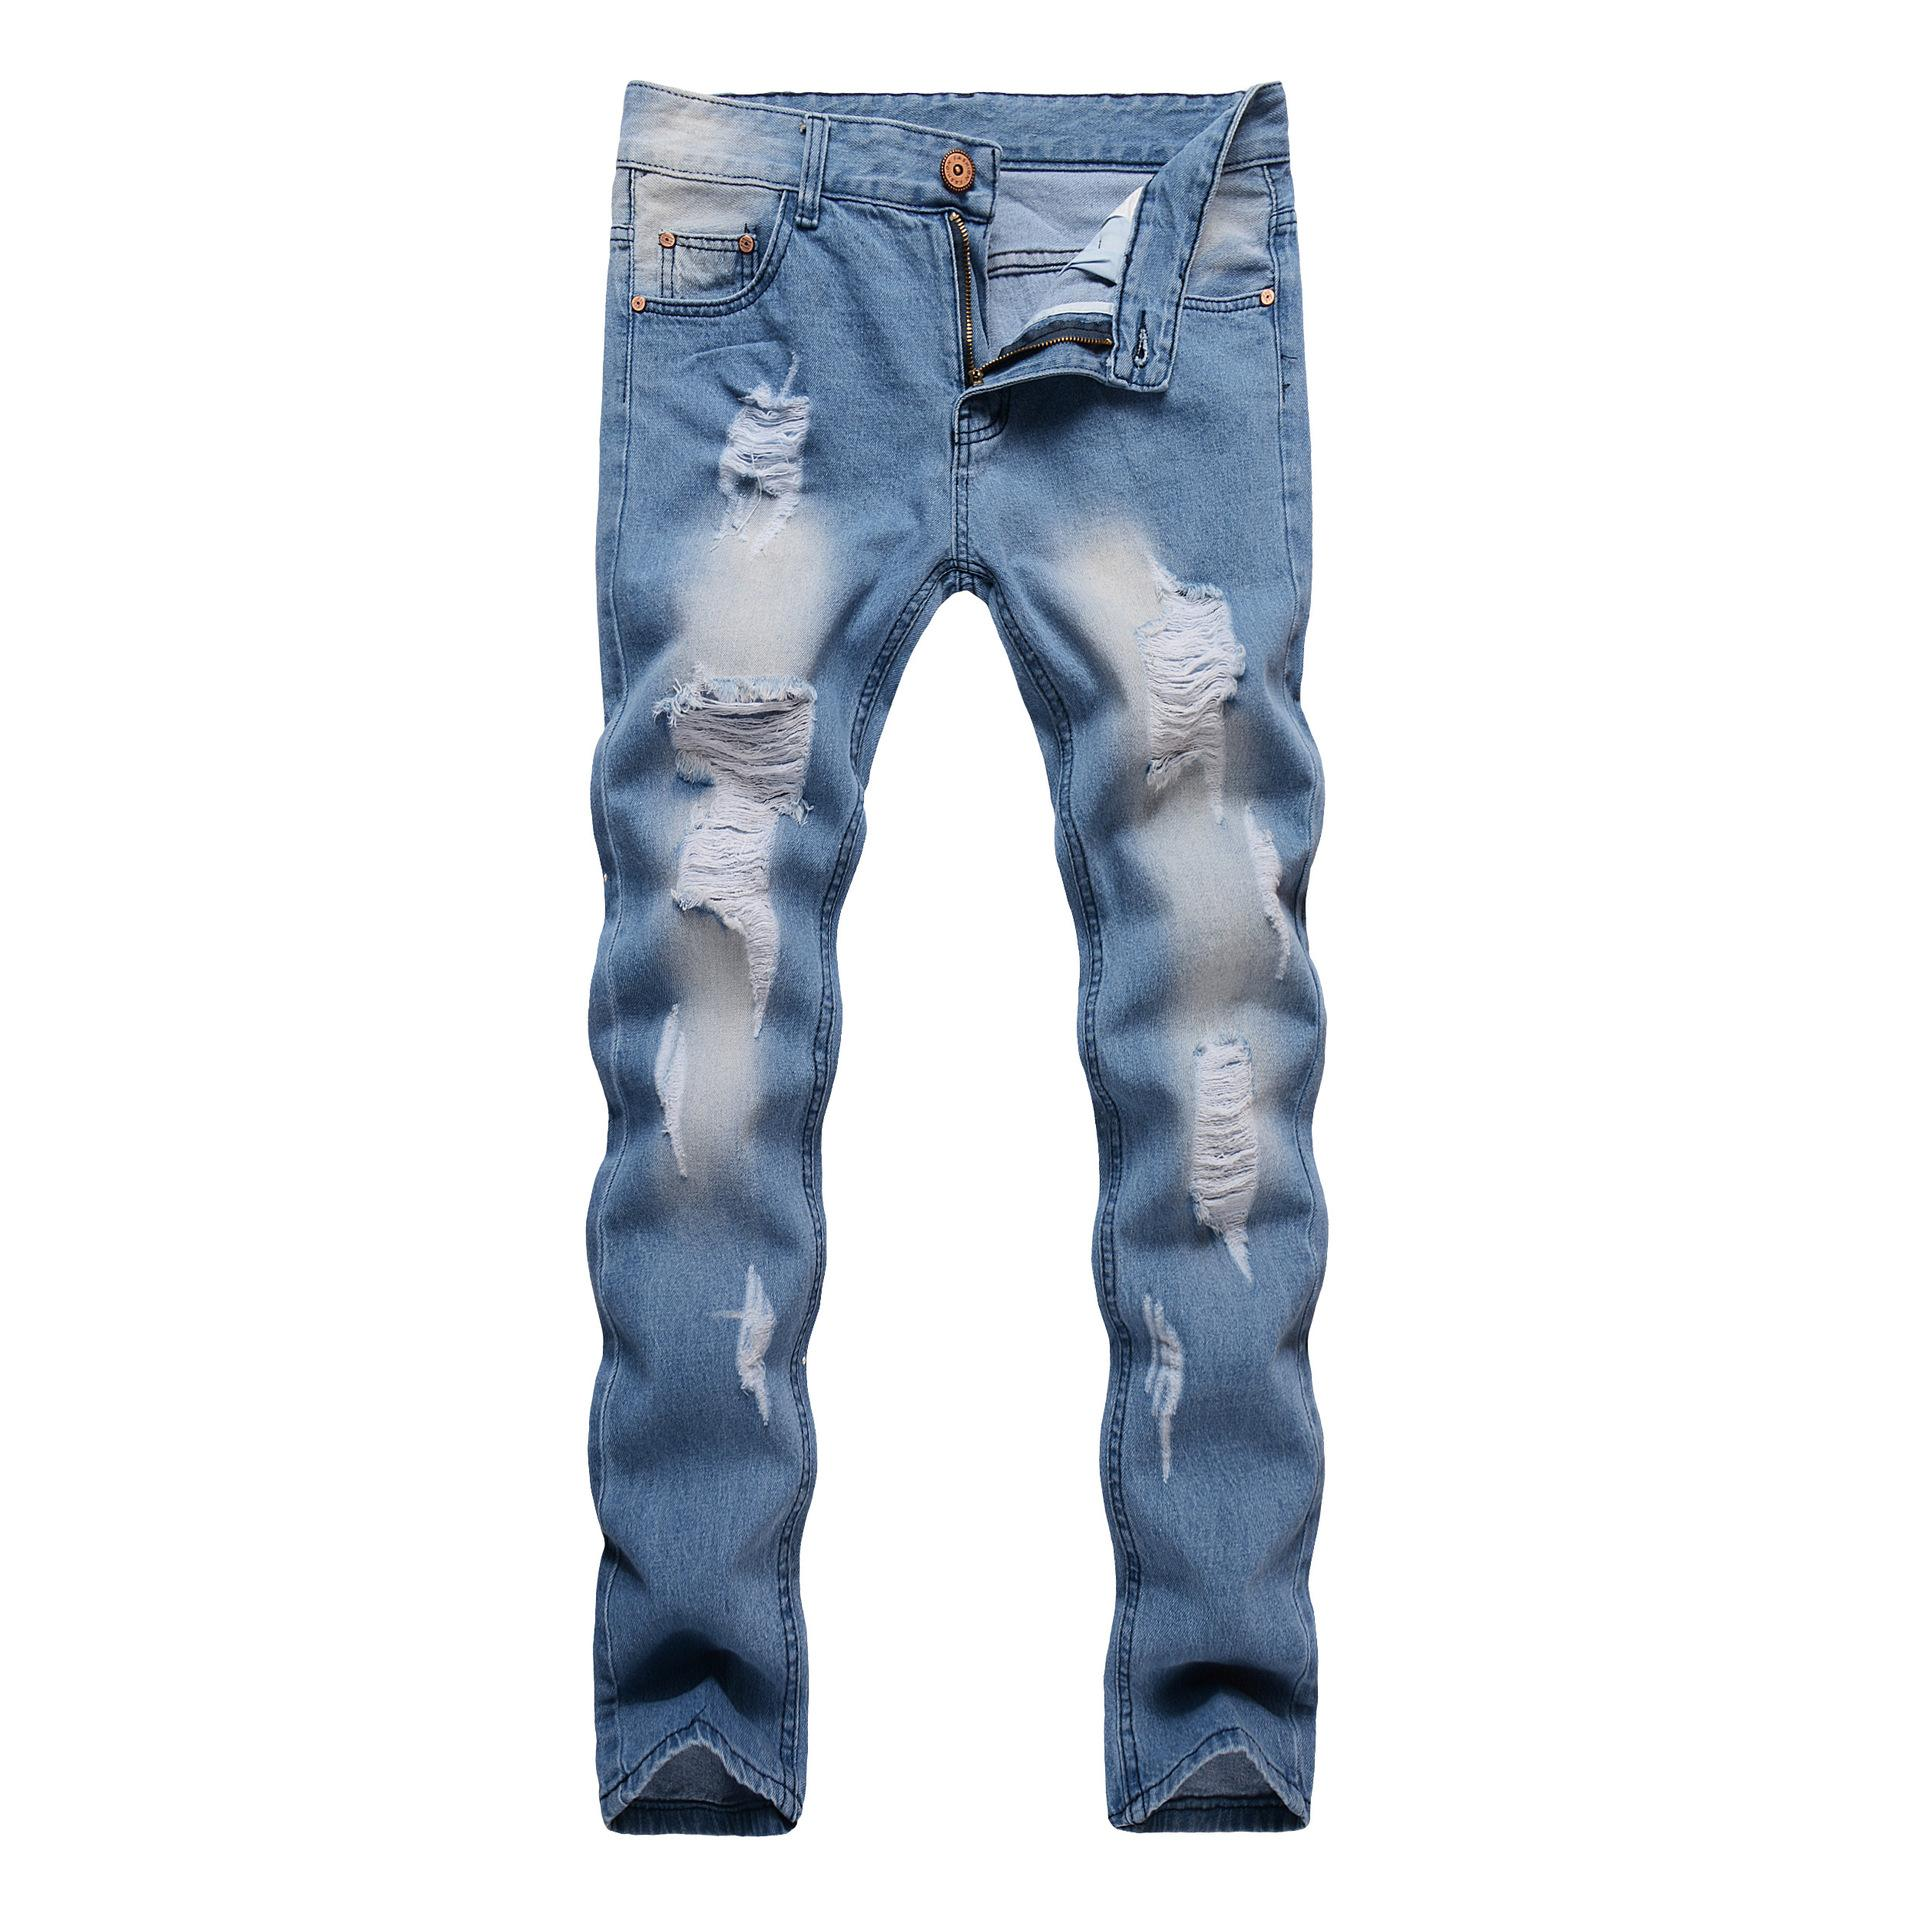 60c73d5610 Compre Pantalones Vaqueros Desgastados Desgastados Desgastados Diseñador De  Moda Pantalones Cortos Para Hombre Pantalones Vaqueros De La Motocicleta  Delgada ...